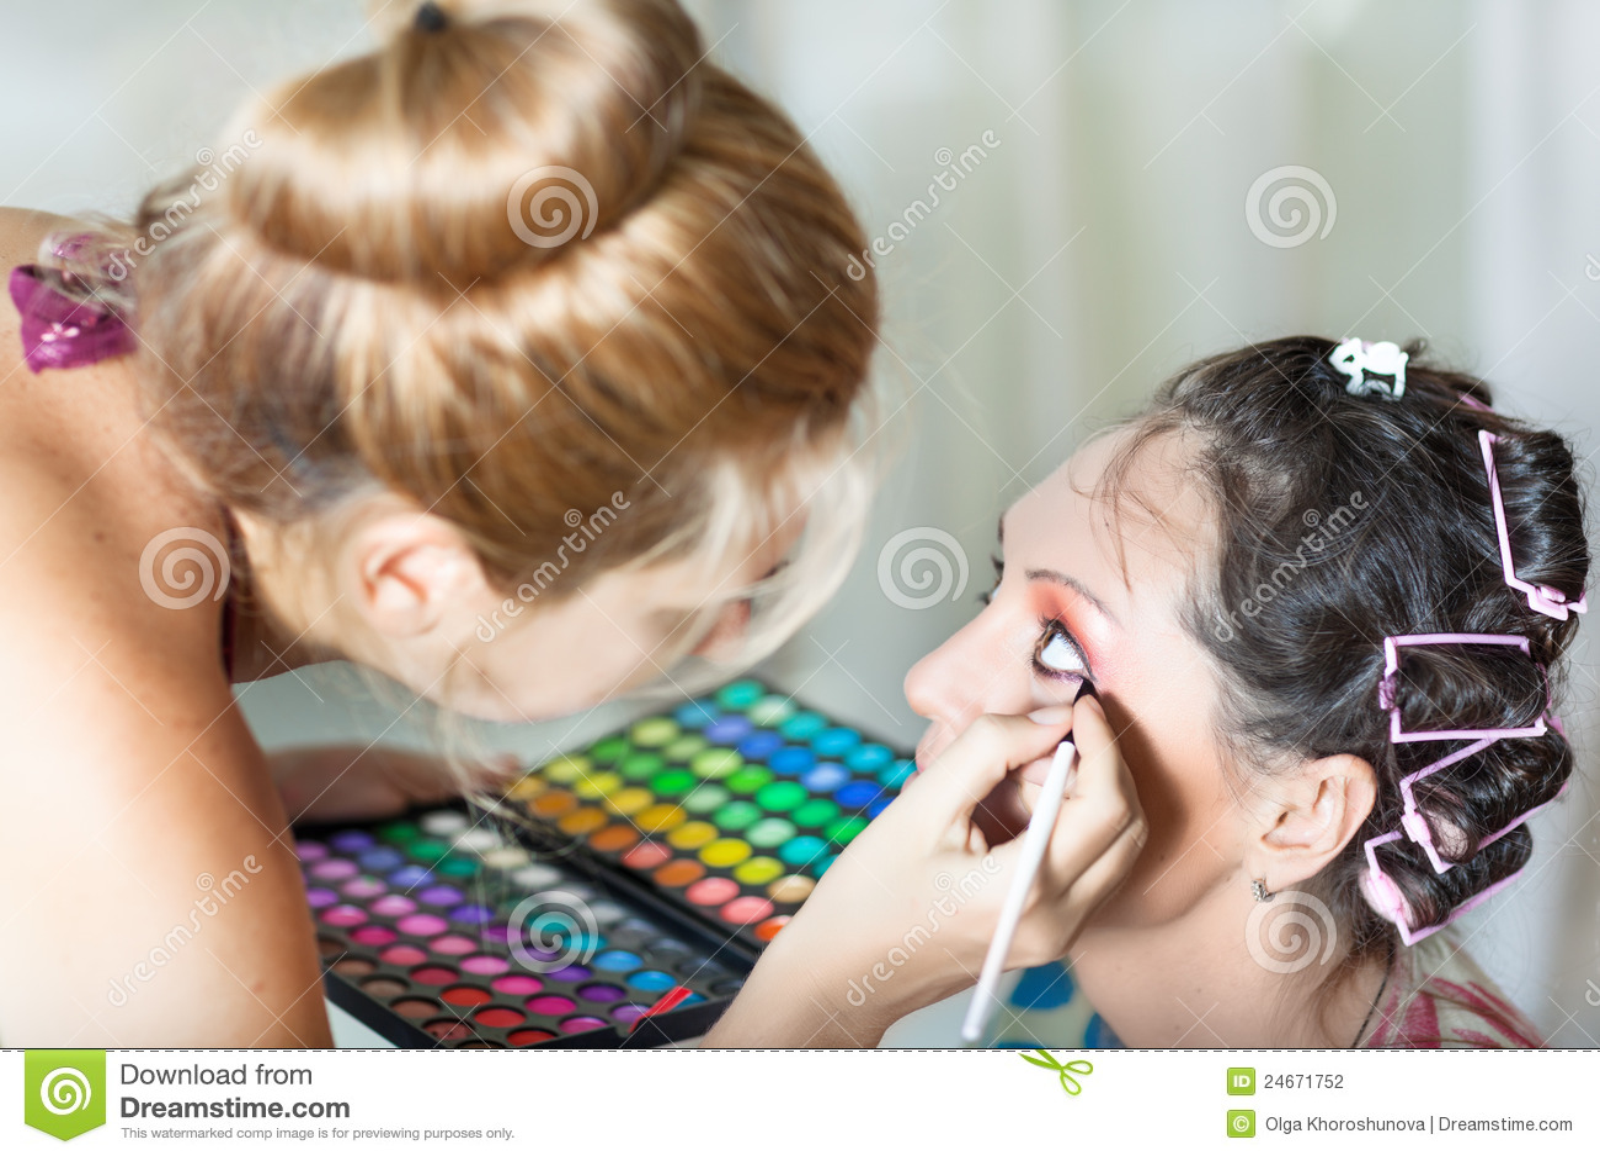 Beauty salon stock photography image 24671752 for Reading beauty salon